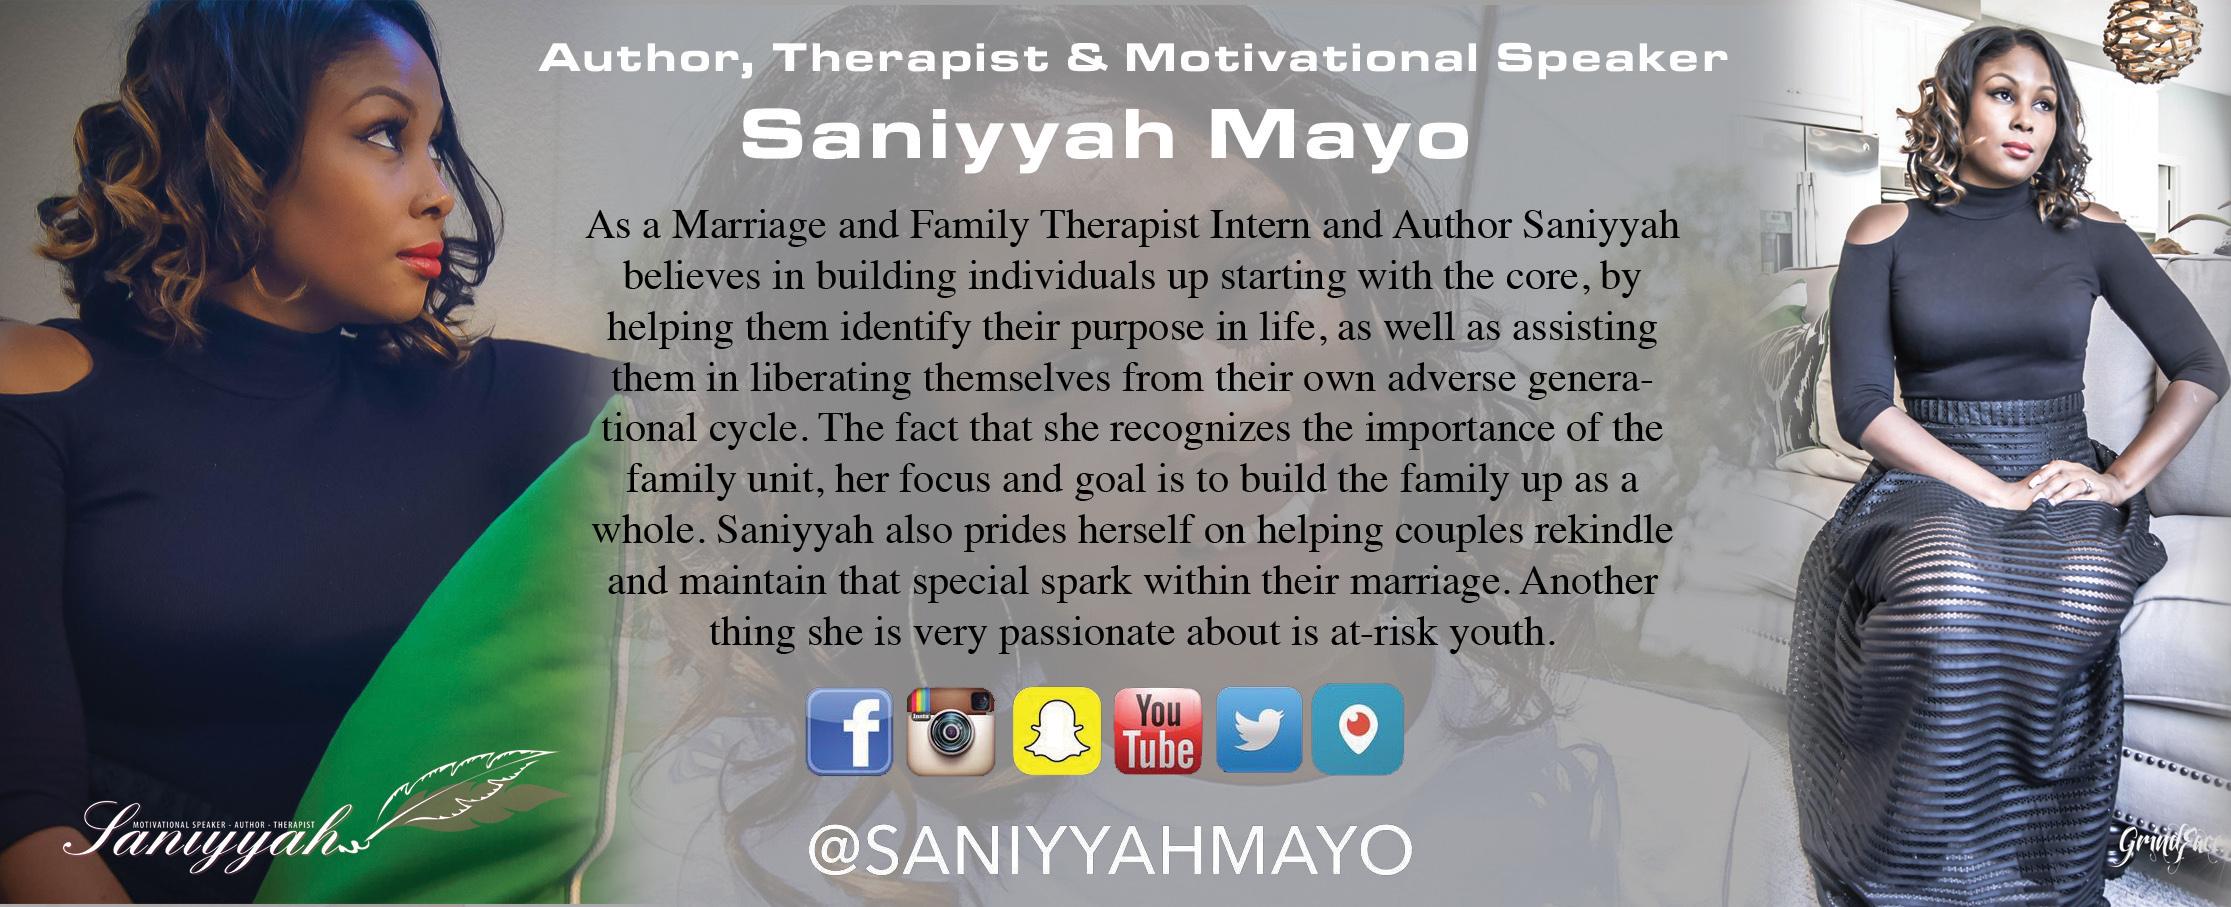 Saniyyah Mayo